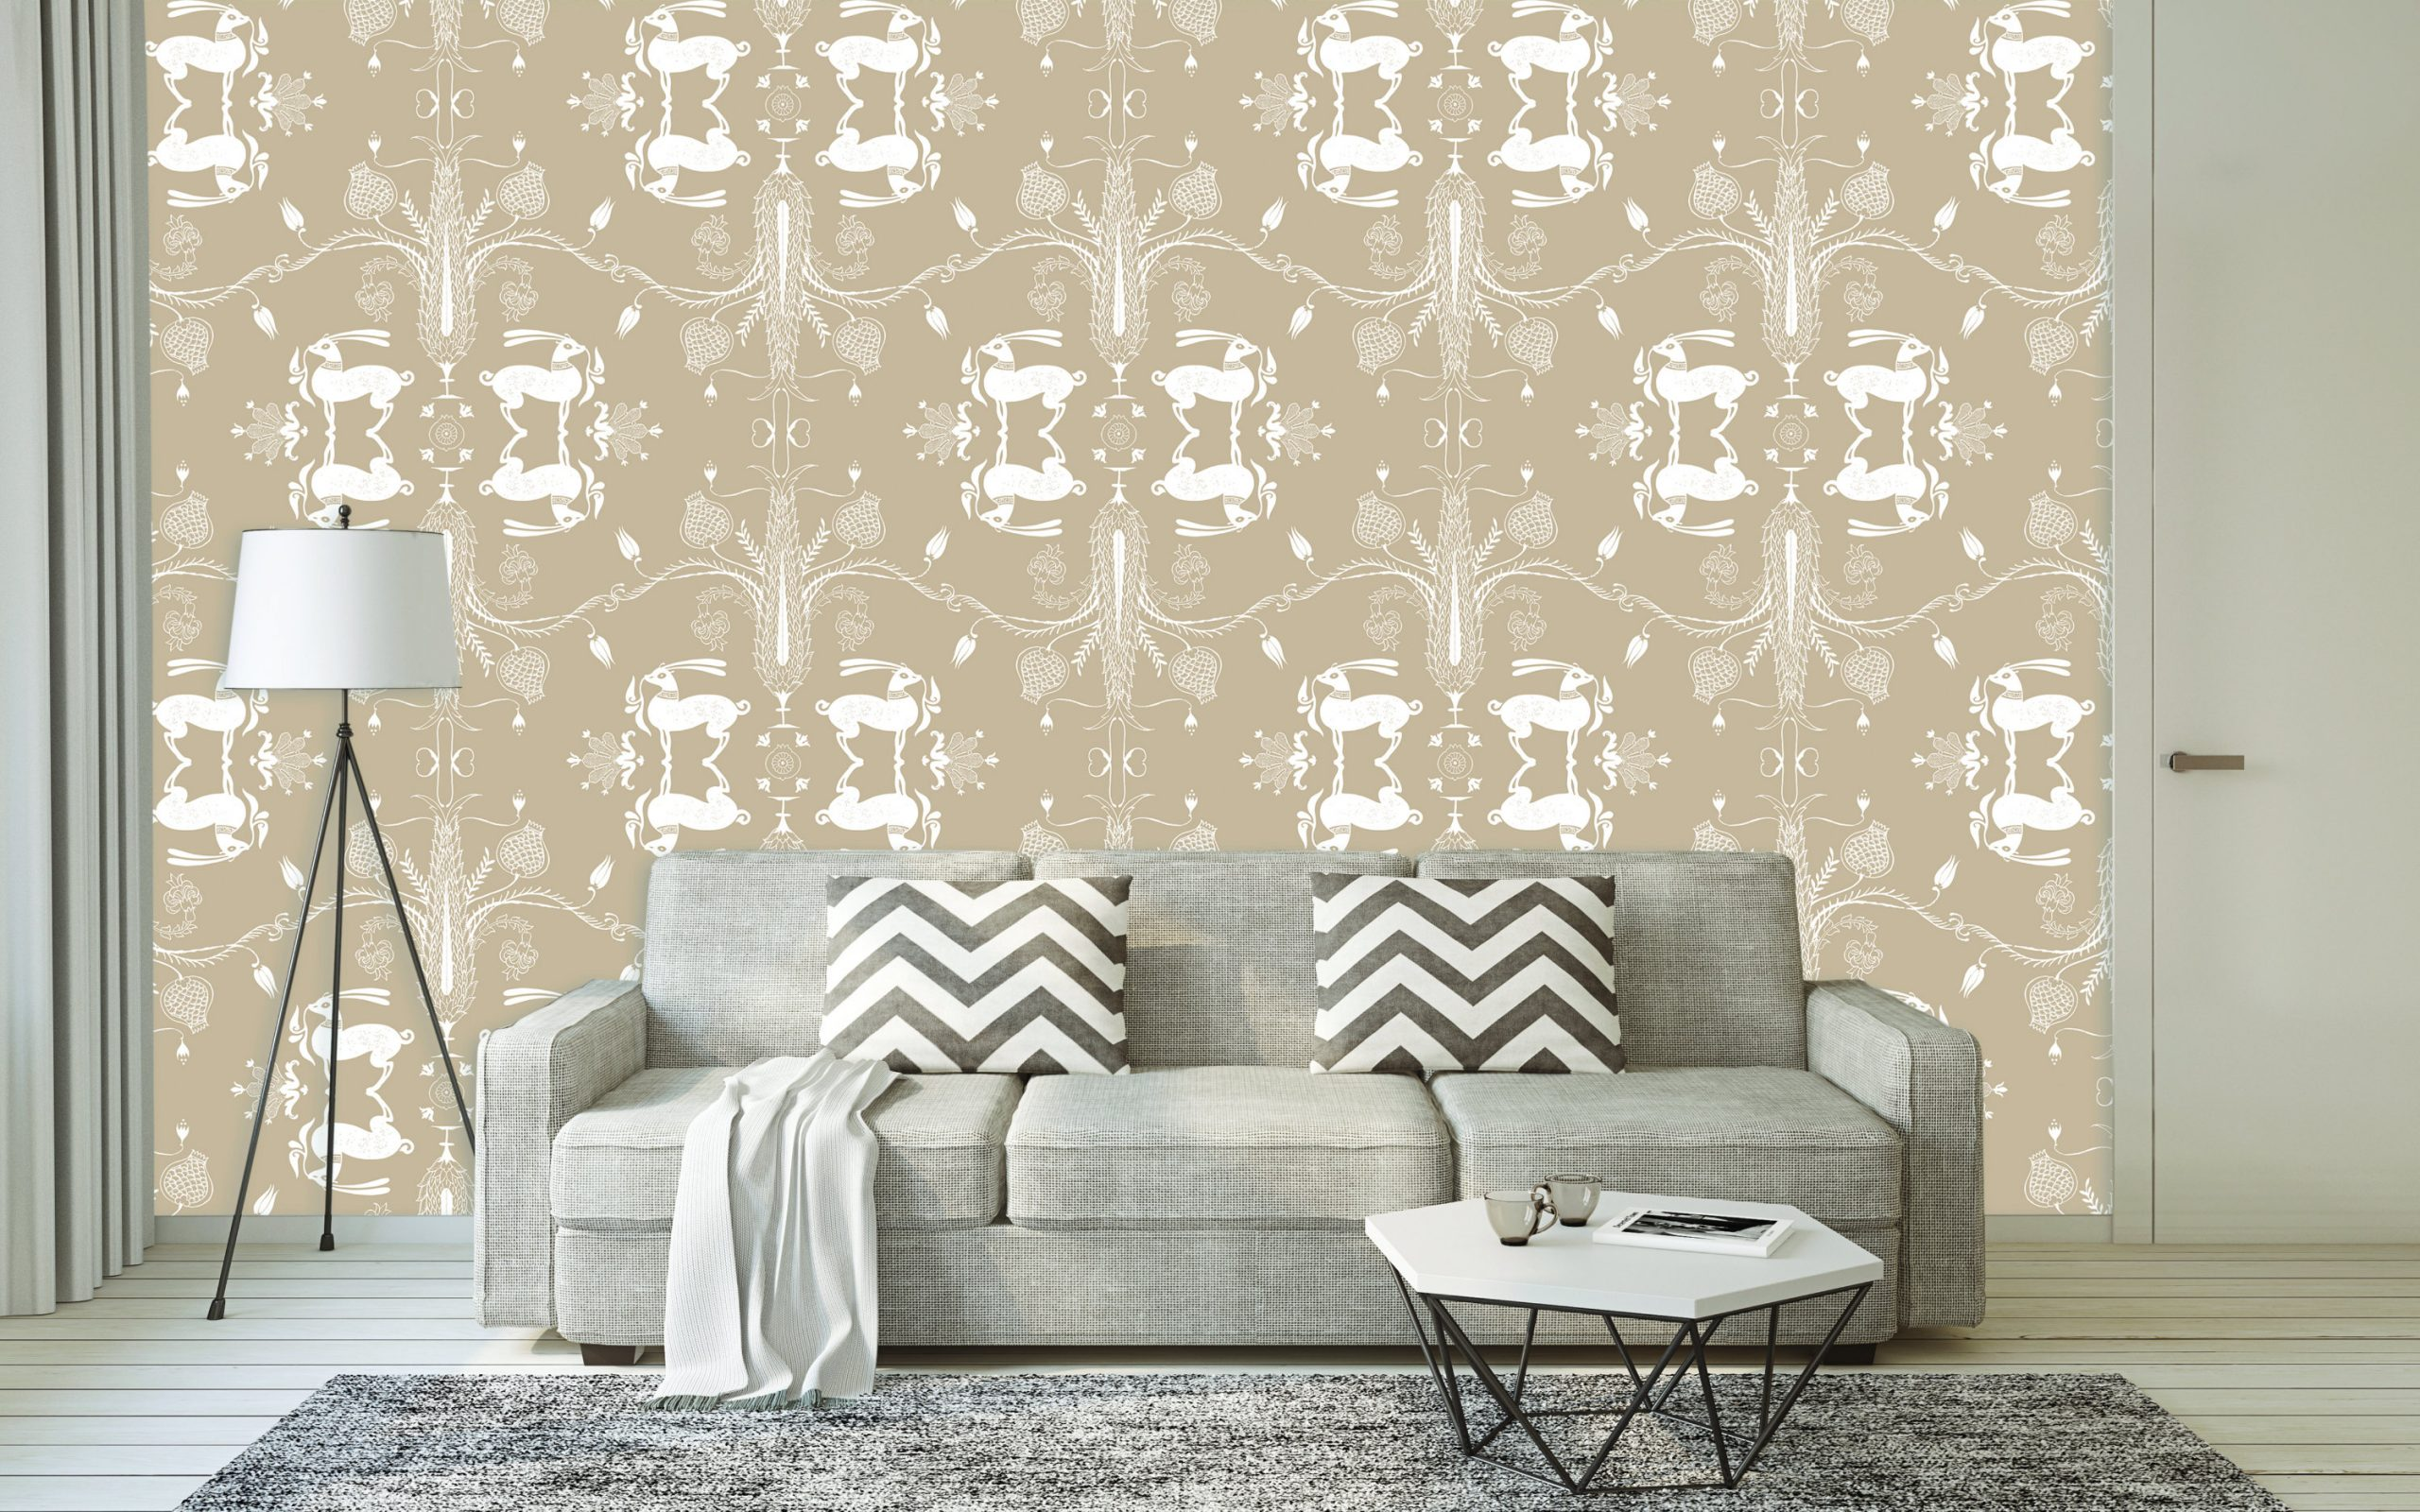 Texture Wall Design Hd - 15x15 - Download HD Wallpaper